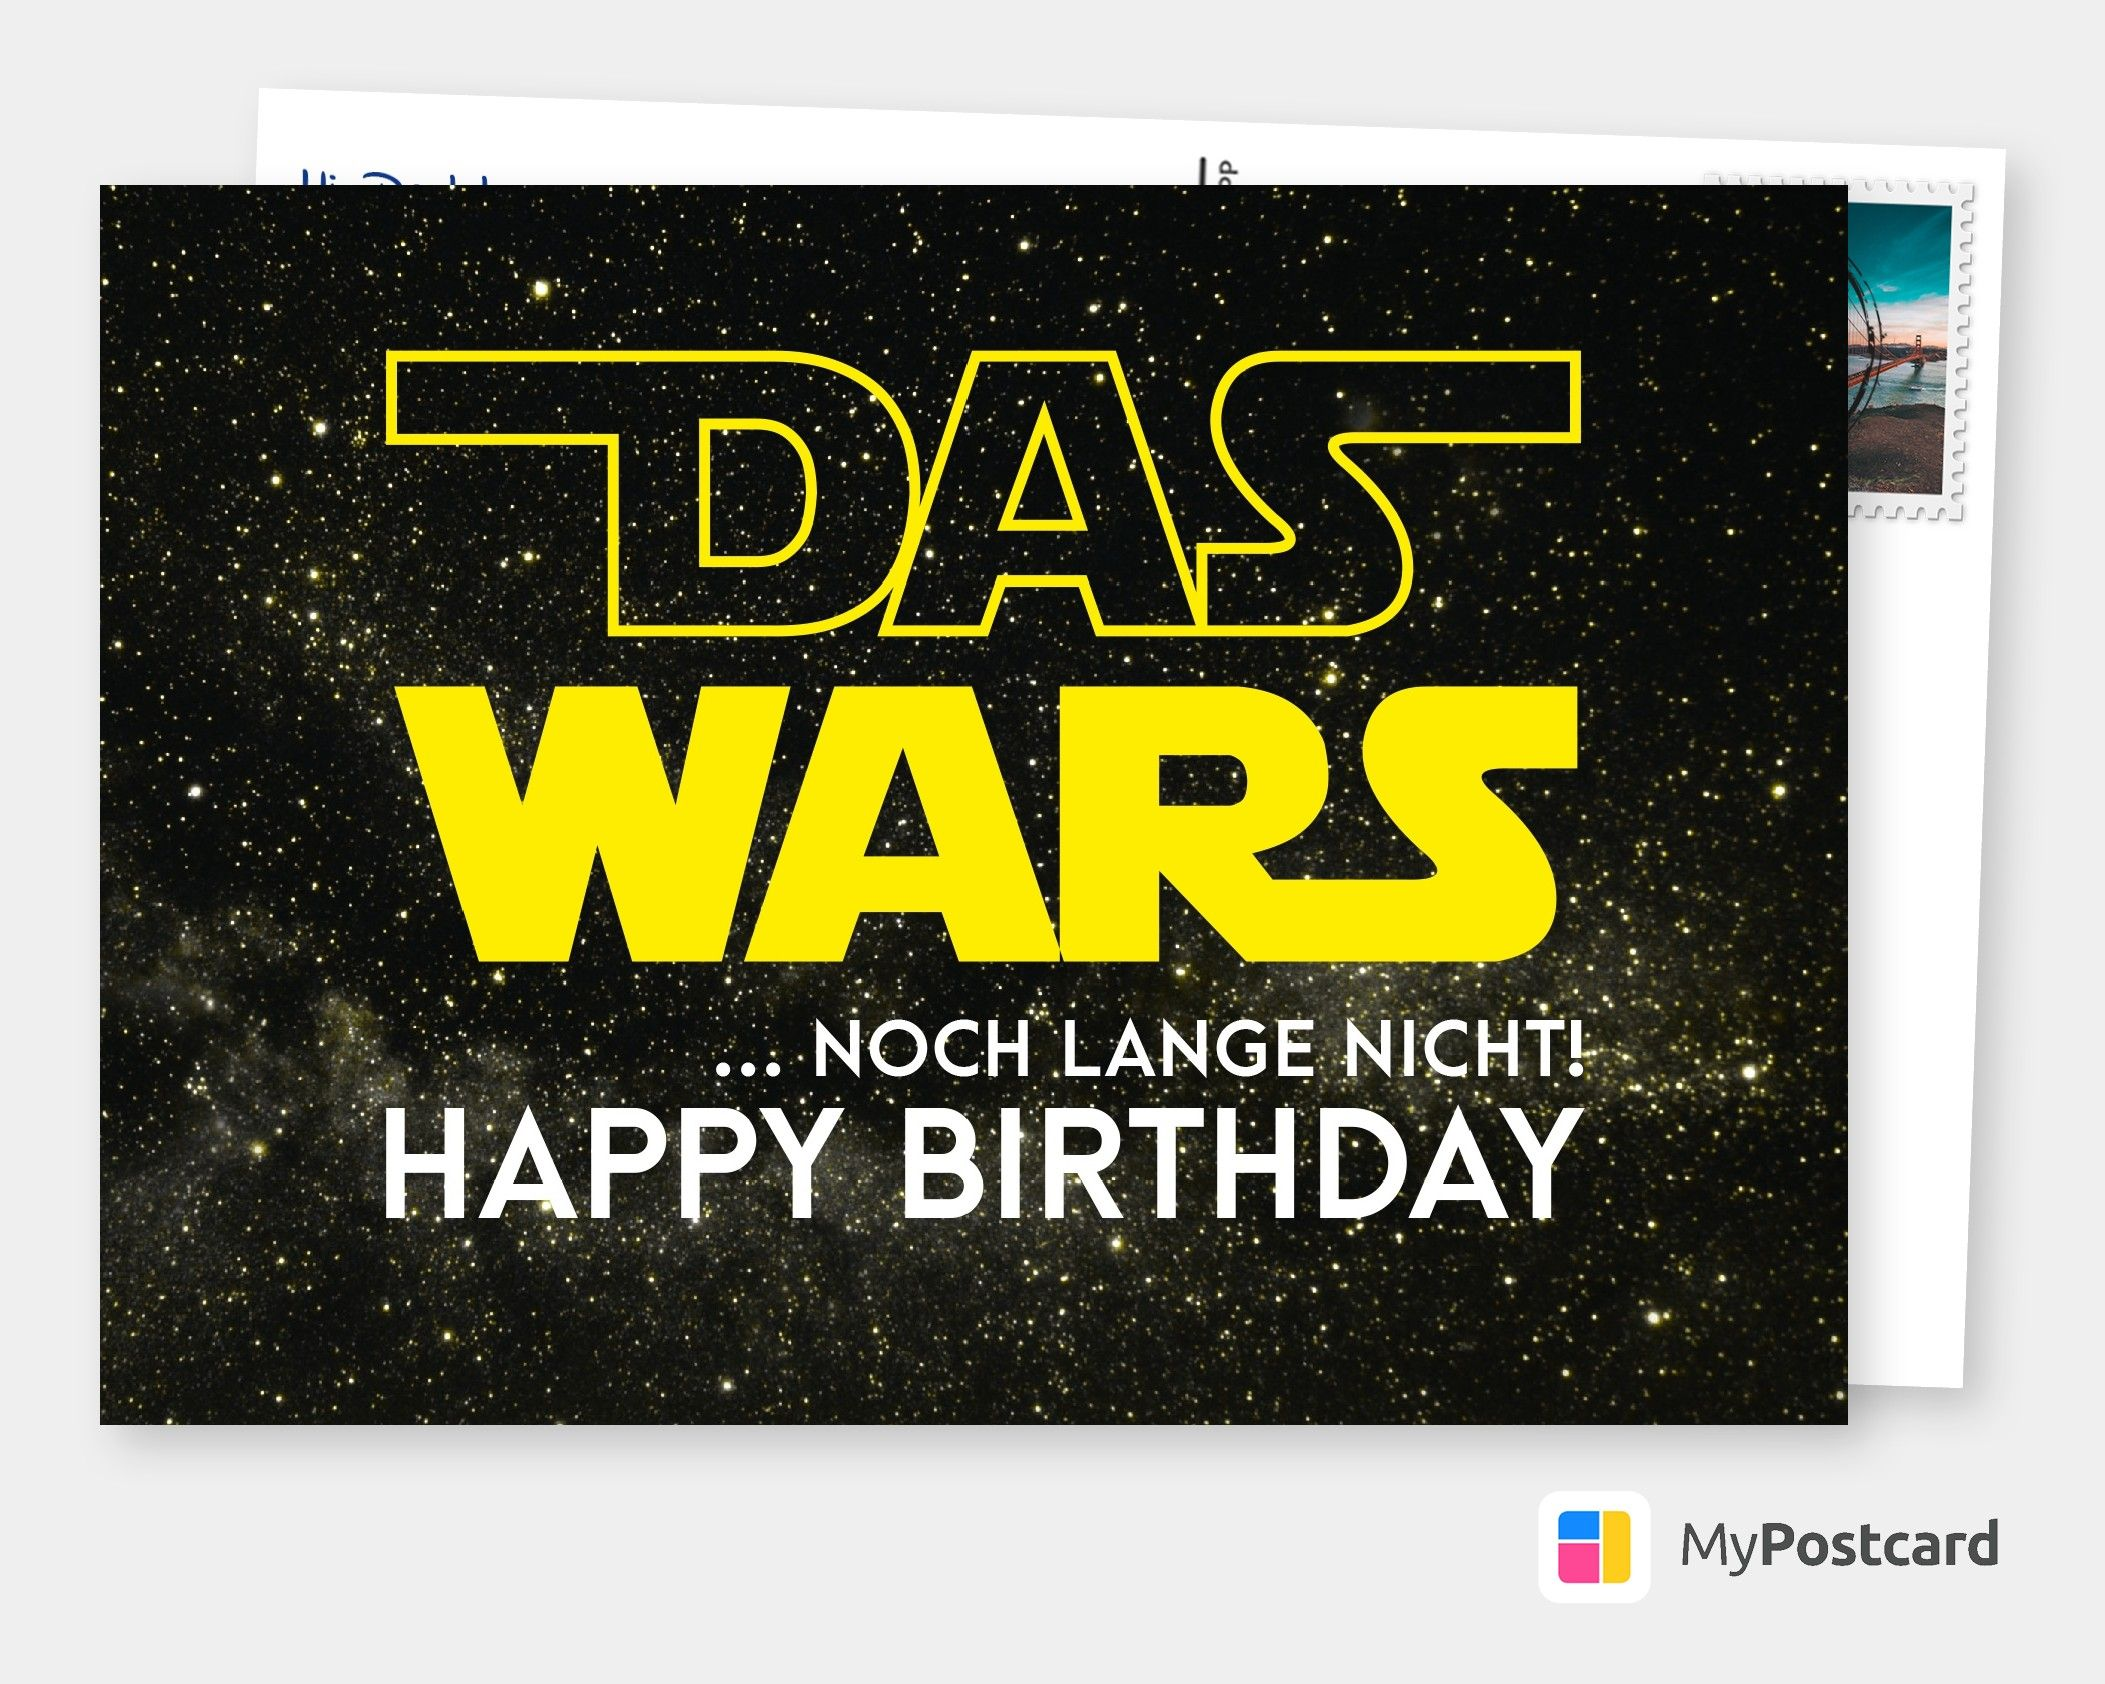 Geburtstag Gratulieren - Geburtstagskarte / Karte zum Geburtstag / Geburtstagsgrüße / Geburtstag